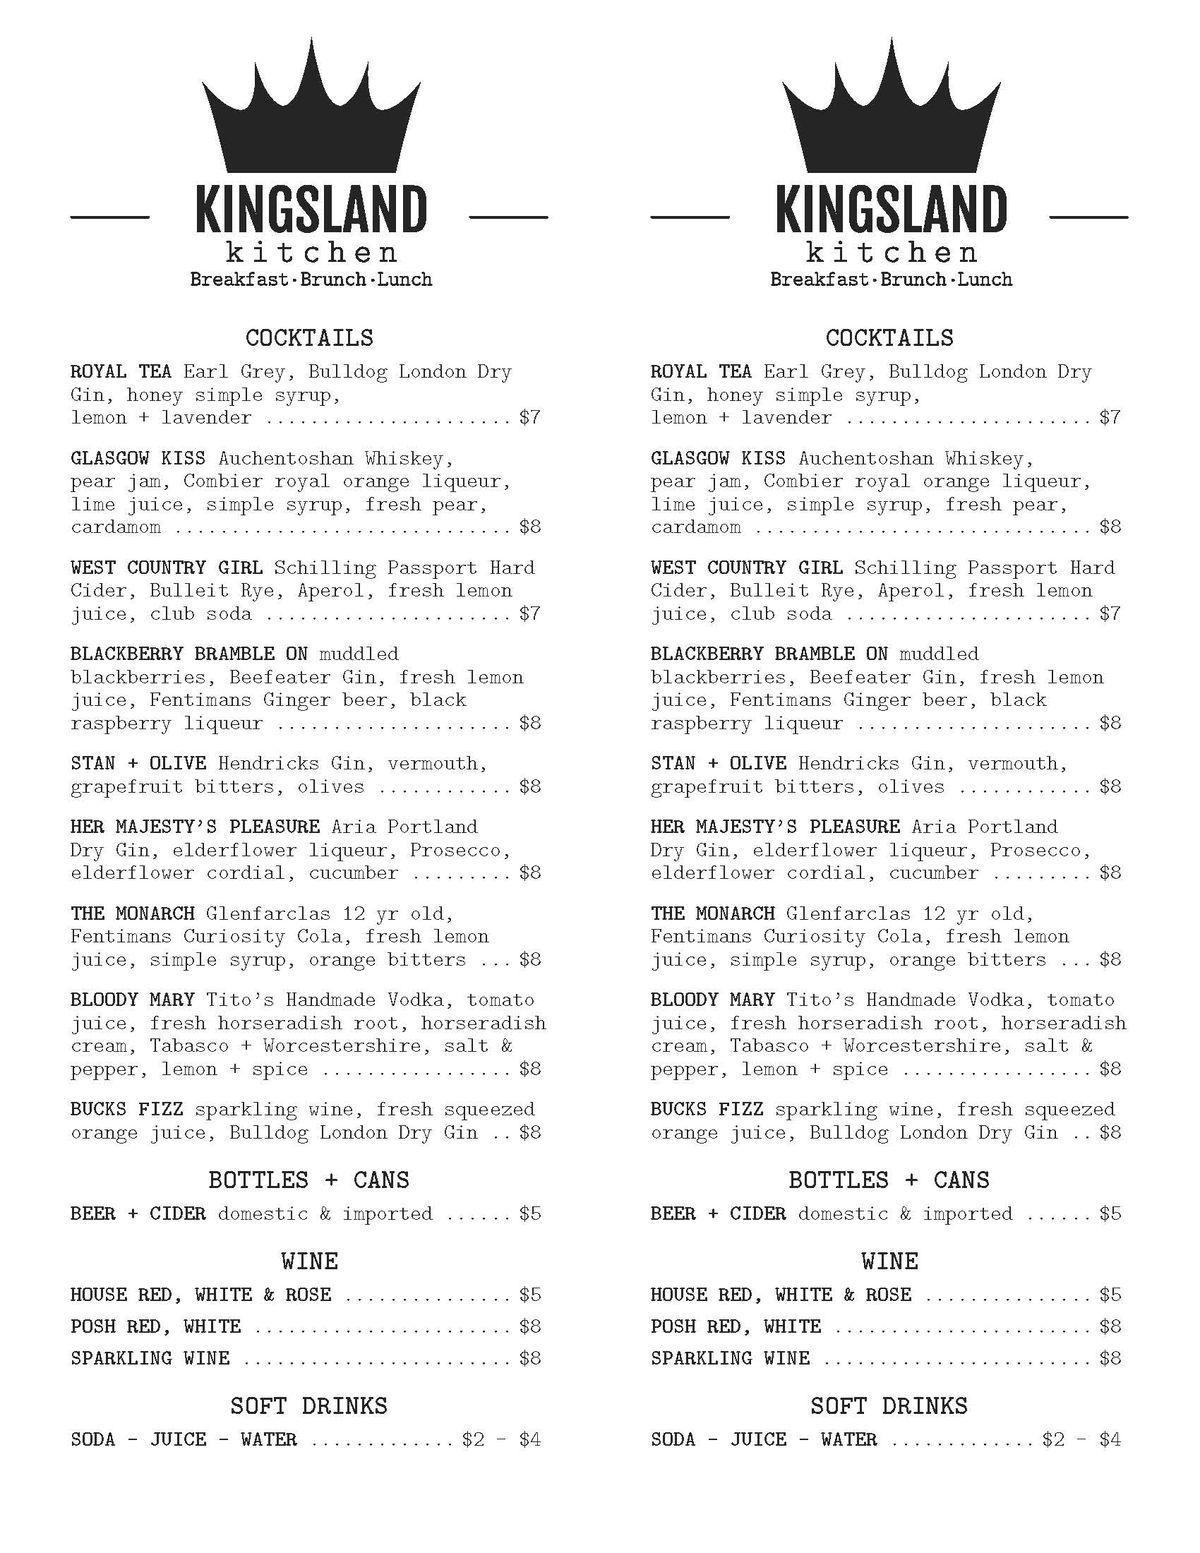 Kingsland Kitchen Finally Reveals Menus Of Inspired